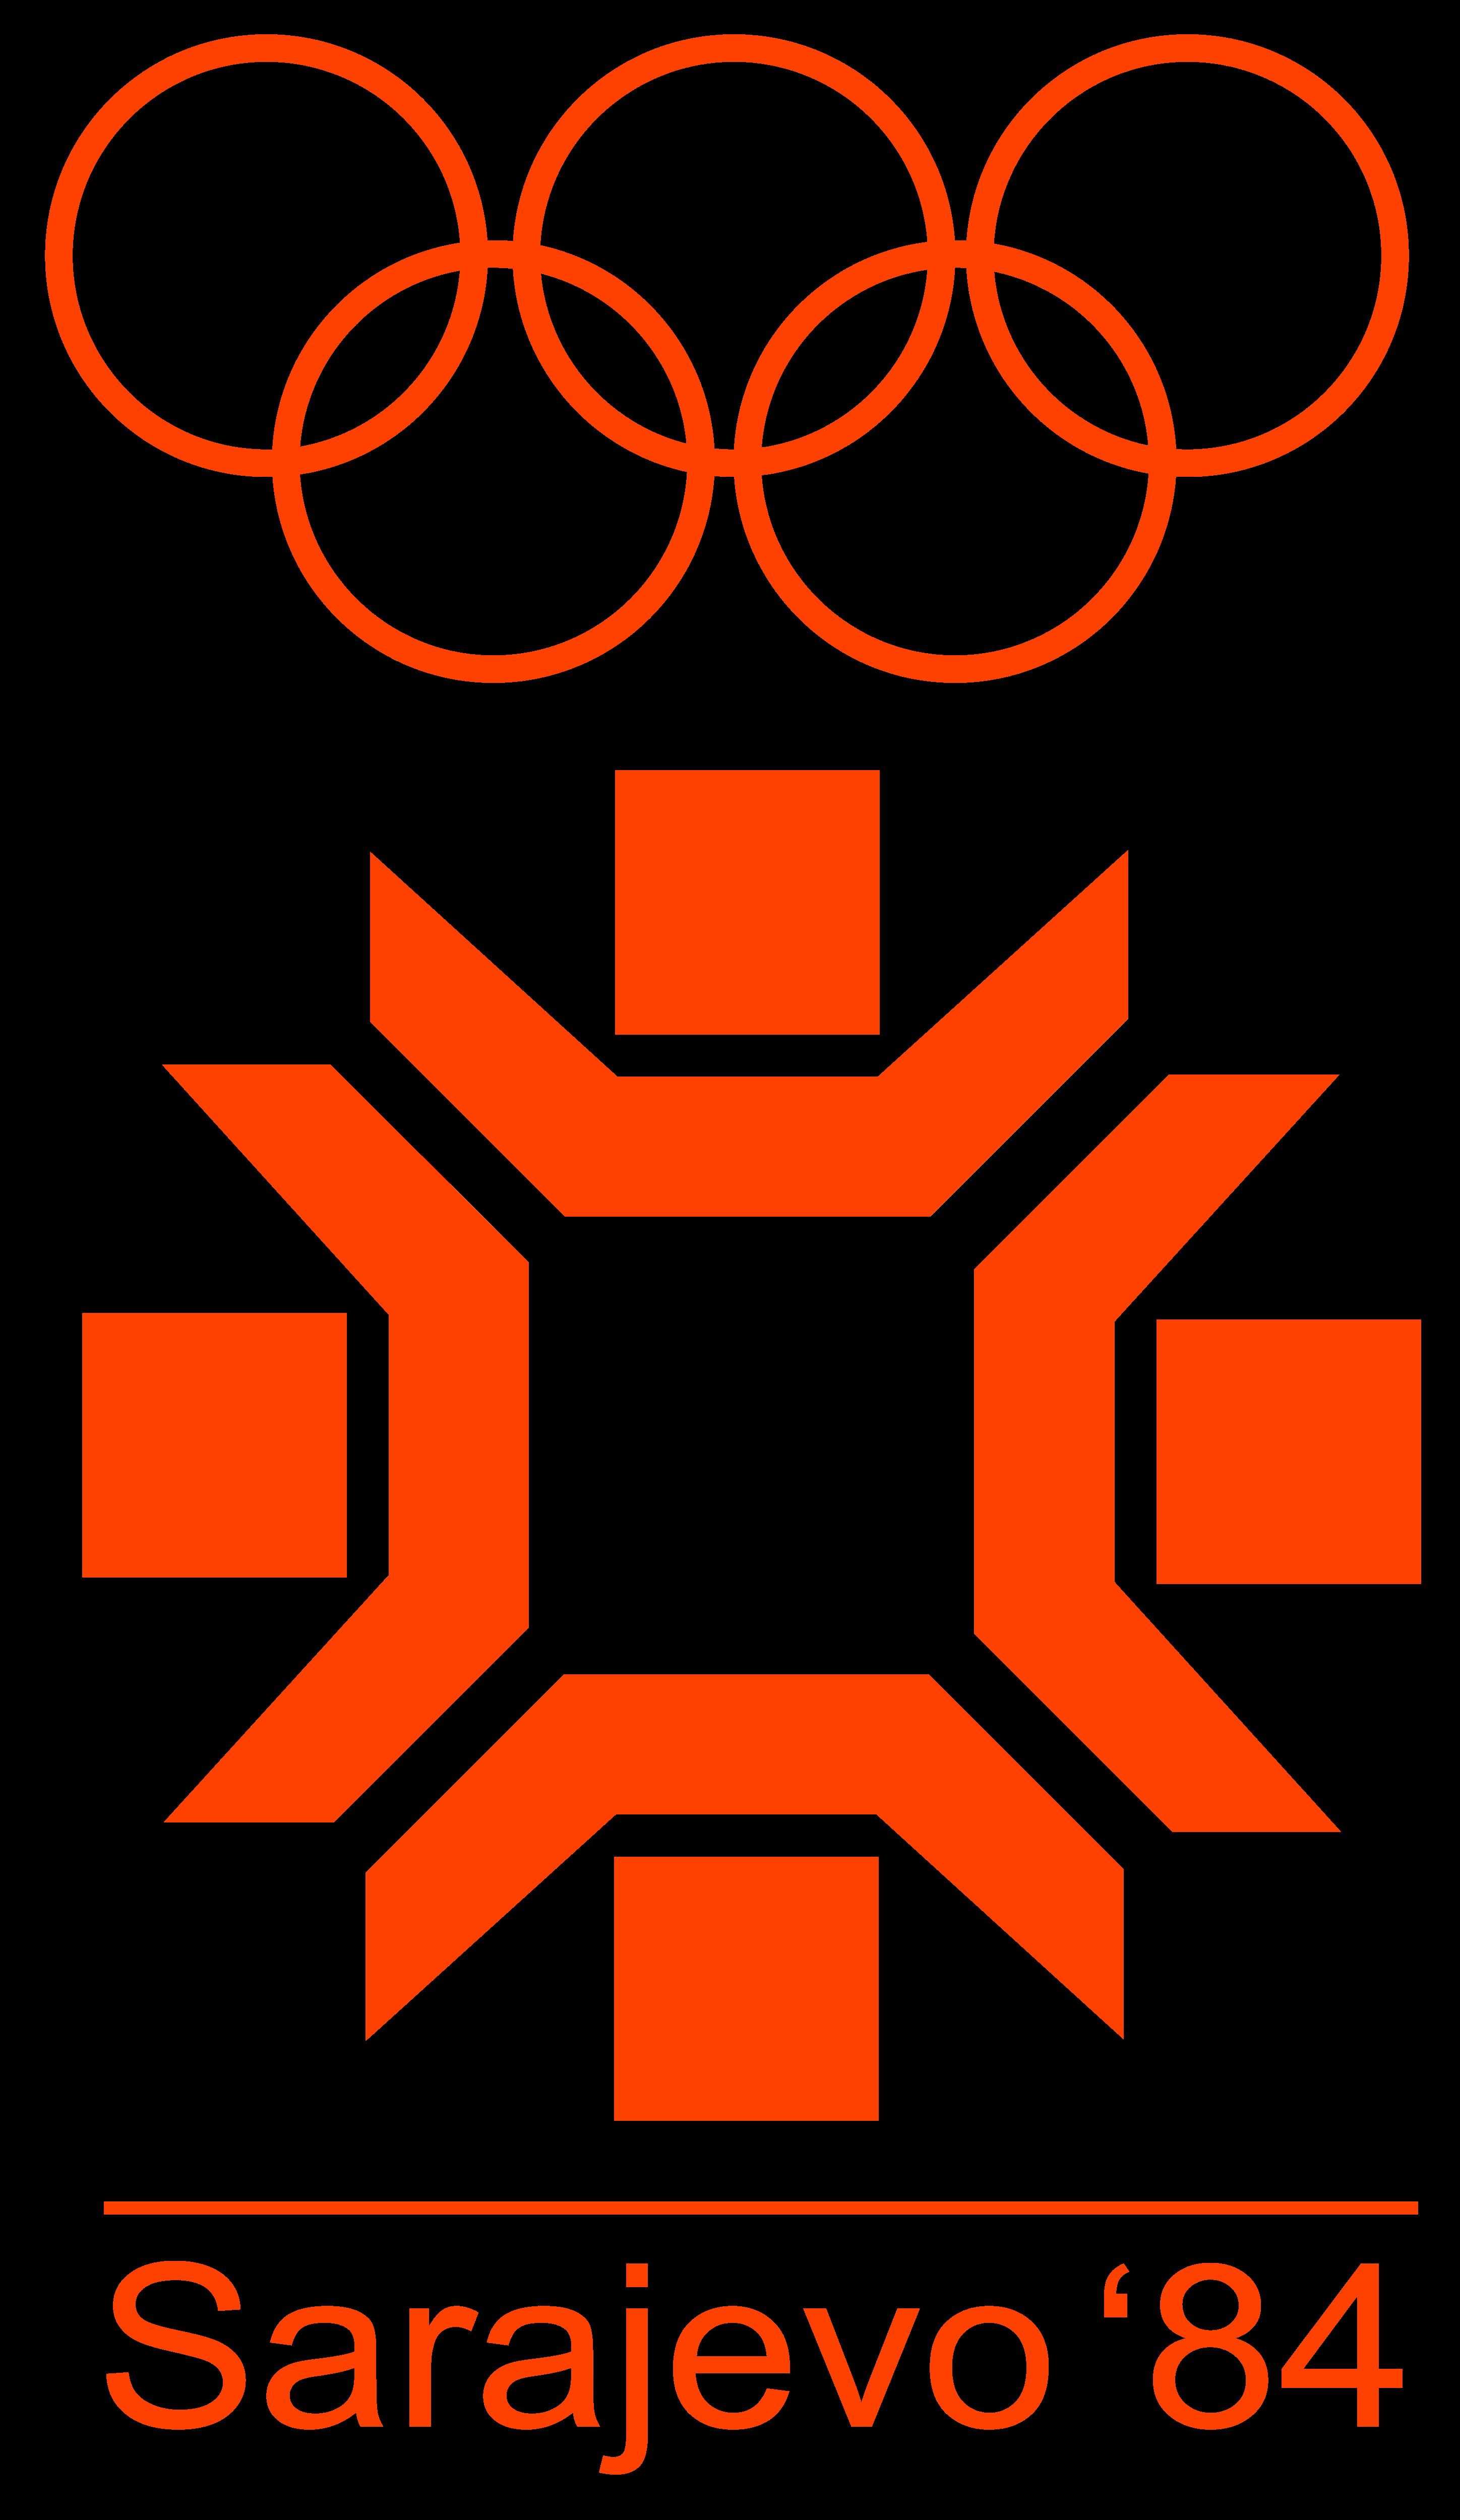 Sarajevo 1984, XIV Winter Olympic Games - Logos Download